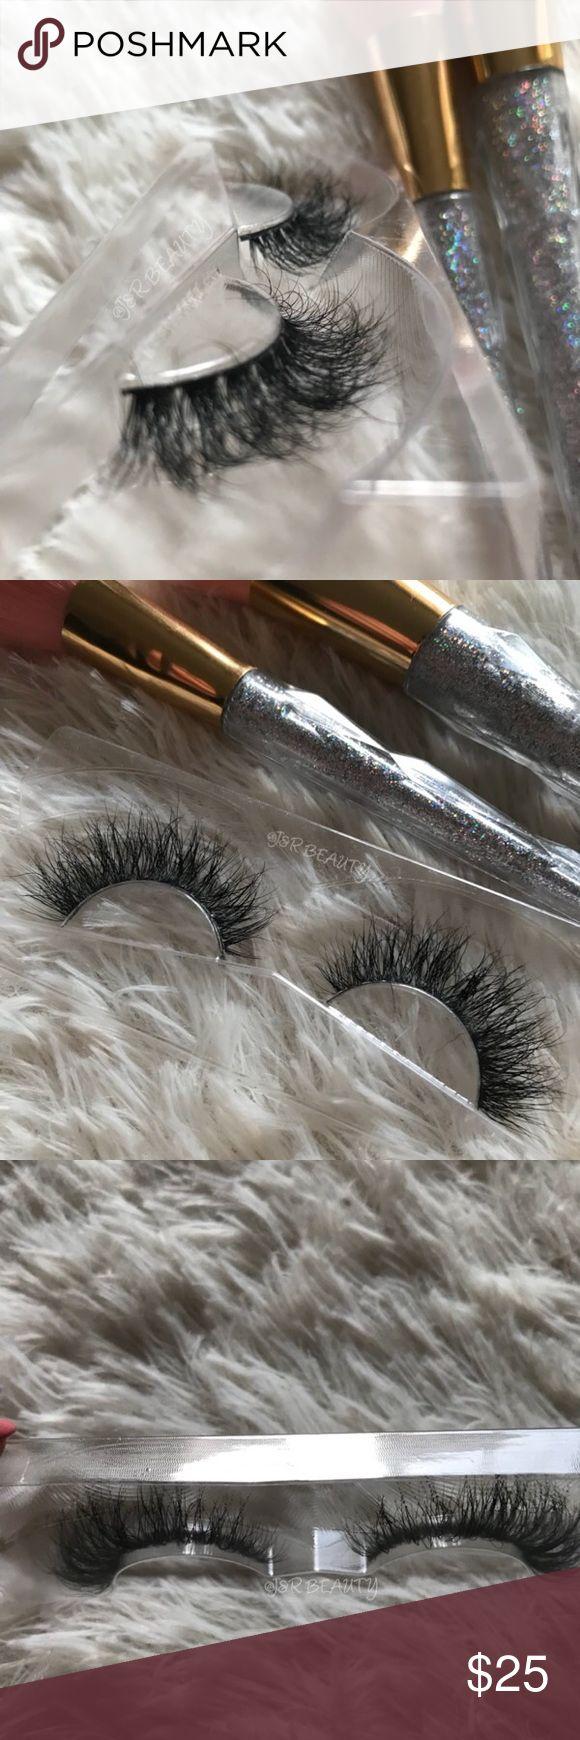 Mink Eyelashes Premium +$2 Add on eyelash Applicator  +$3 Add on eyelash glue Please message me if you want to add them.   ❌No Offers ✅ Bundle &  Save  # tags Iconic, mink, red cherry eyelashes, house of lashes, doll, kawaii, case, full, natural,  Koko, Ardell, wispies, Demi , makeup, mascara, eyelash applicator, Mykonos Mink , Lashes , wispy ,eyelash case, mink lashes  Ship within 24 hours ❣️  This item is only 1 available ⭐️✨✅ Makeup False Eyelashes